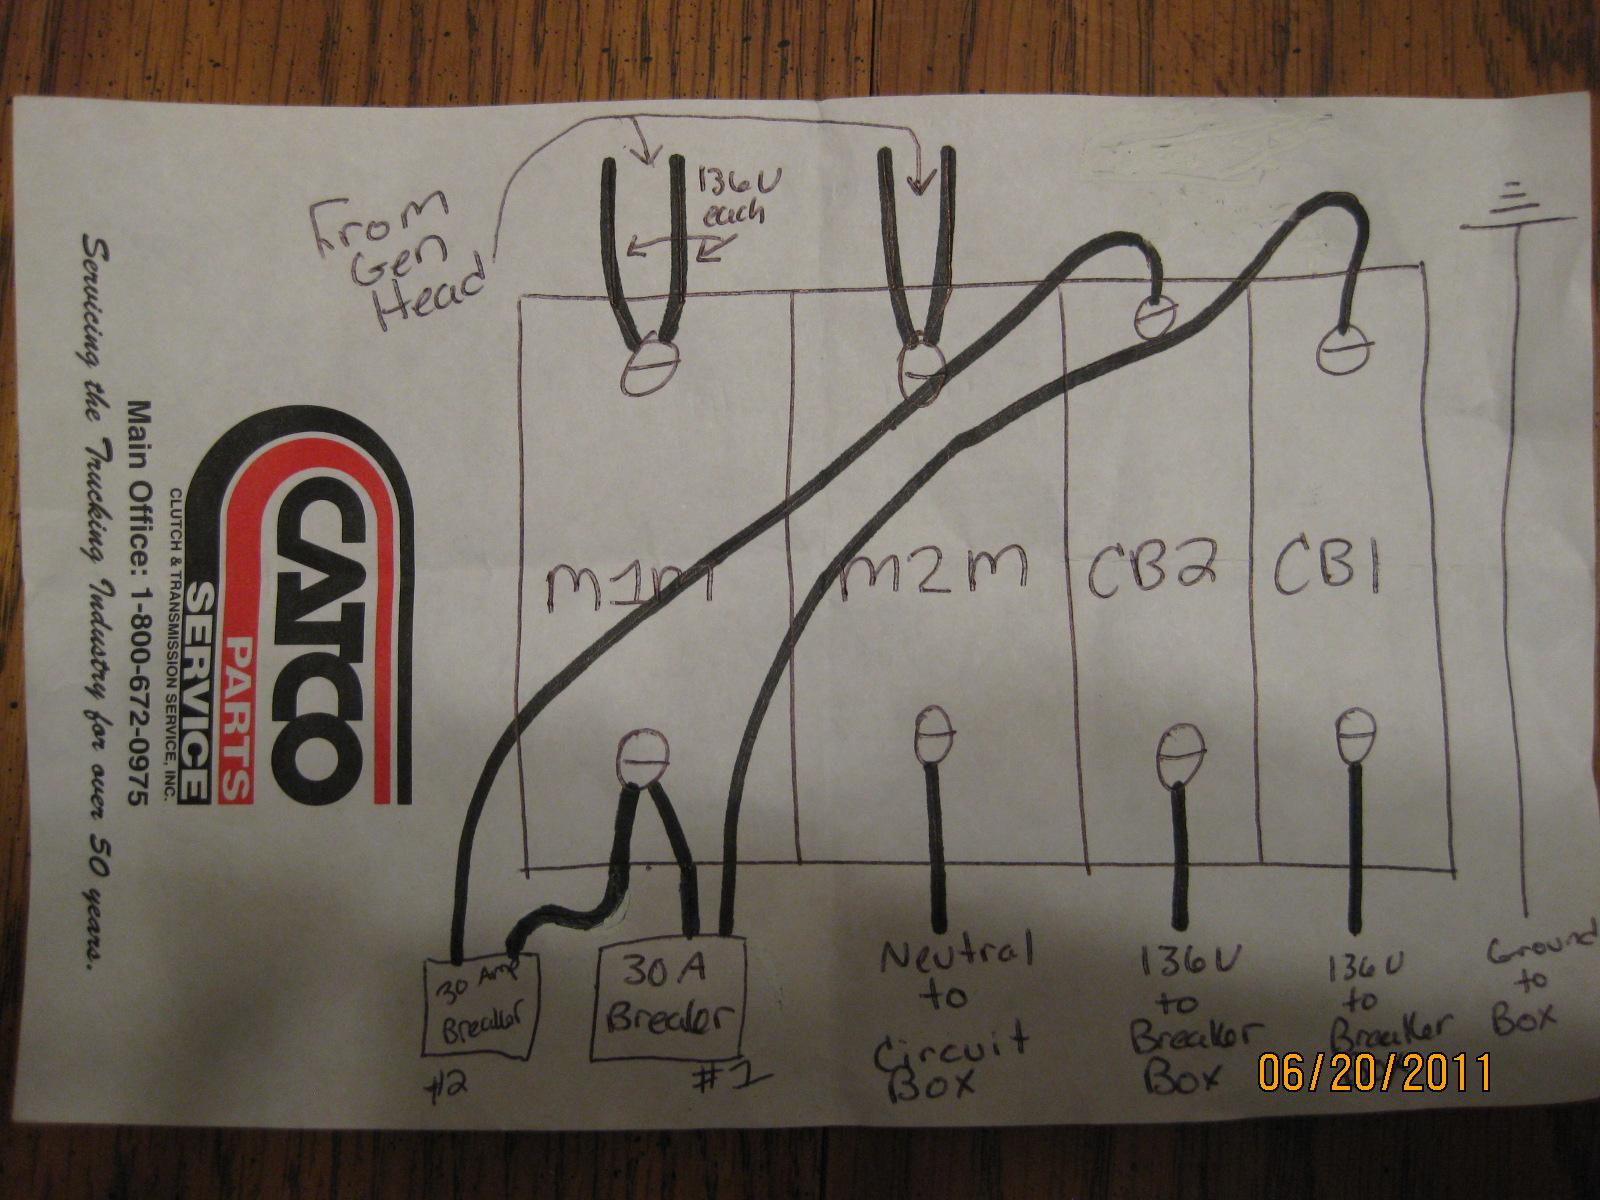 Circuit Breaker Panel Wiring Diagram Besides 240 Wiring Diagrams